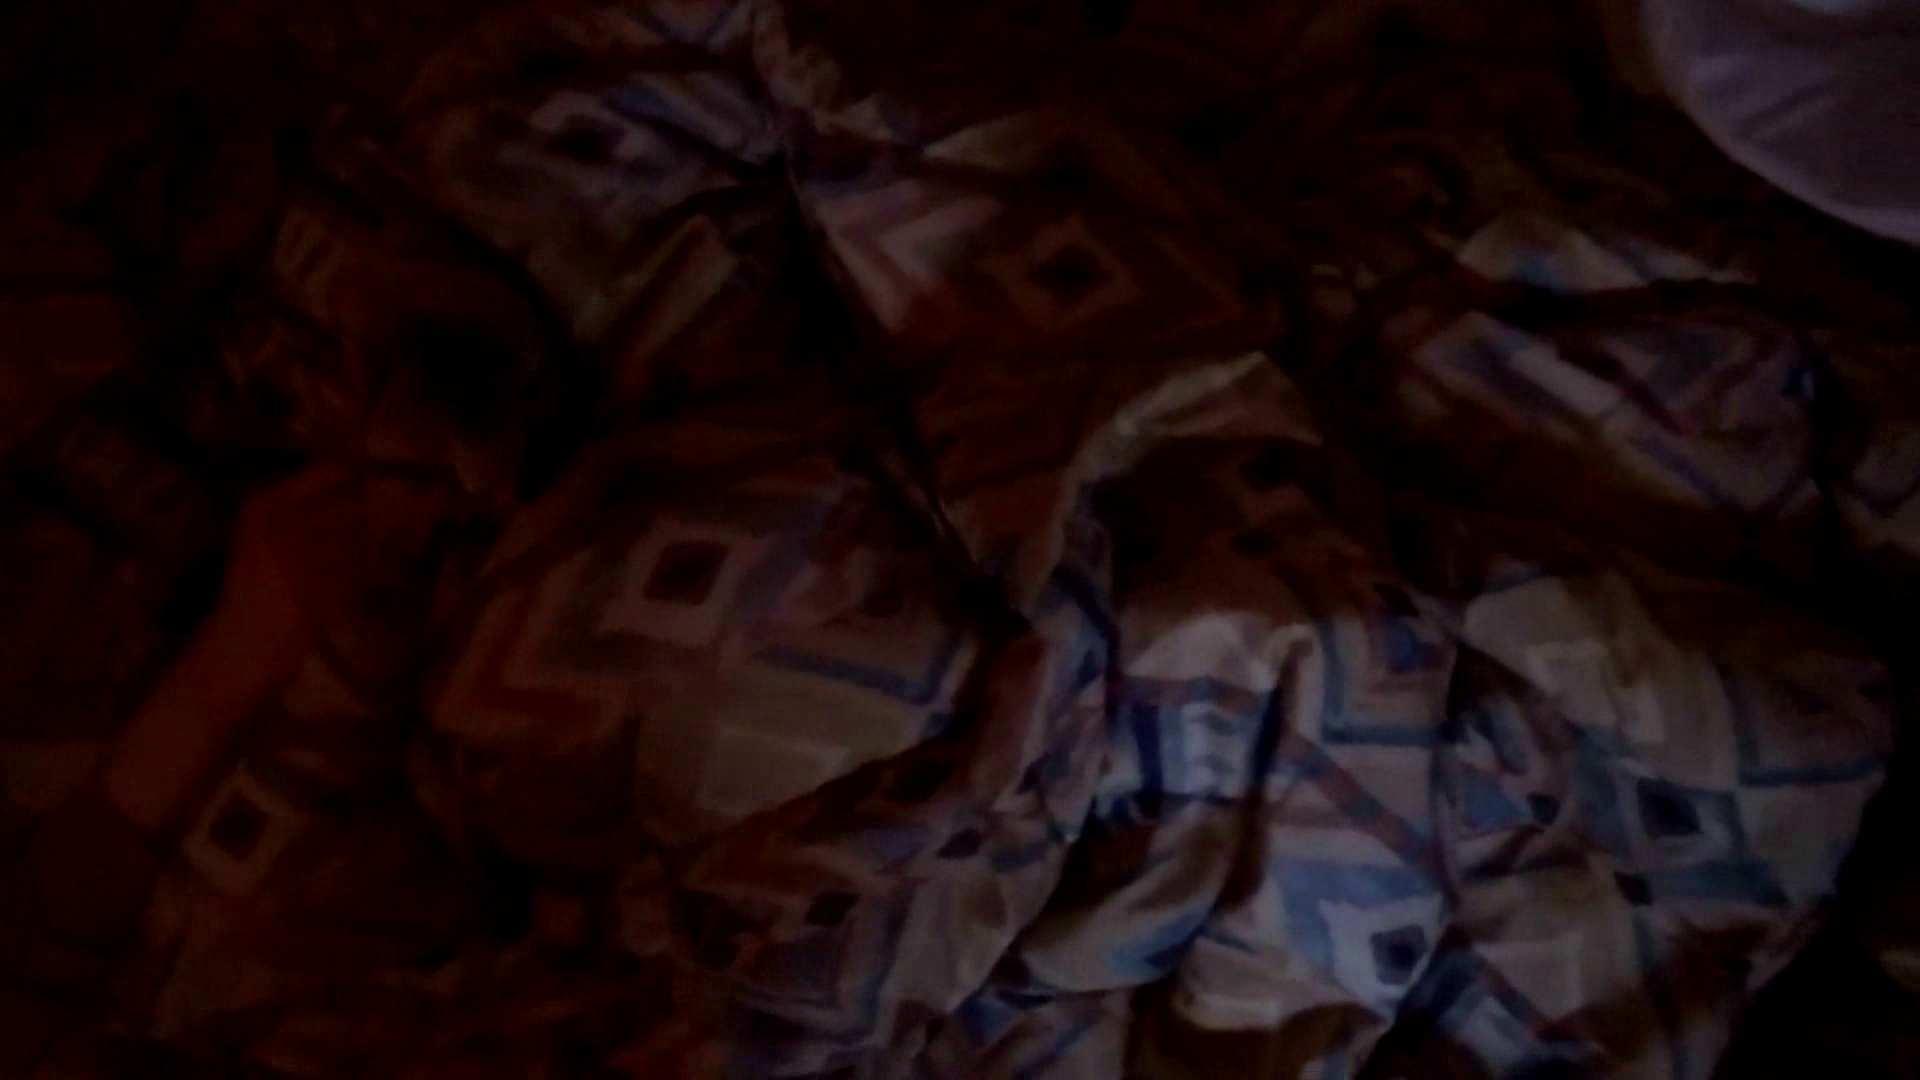 vol.31 【KTちゃん】現役JD居酒屋アルバイト 3回目? 美乳 アダルト動画キャプチャ 93枚 5